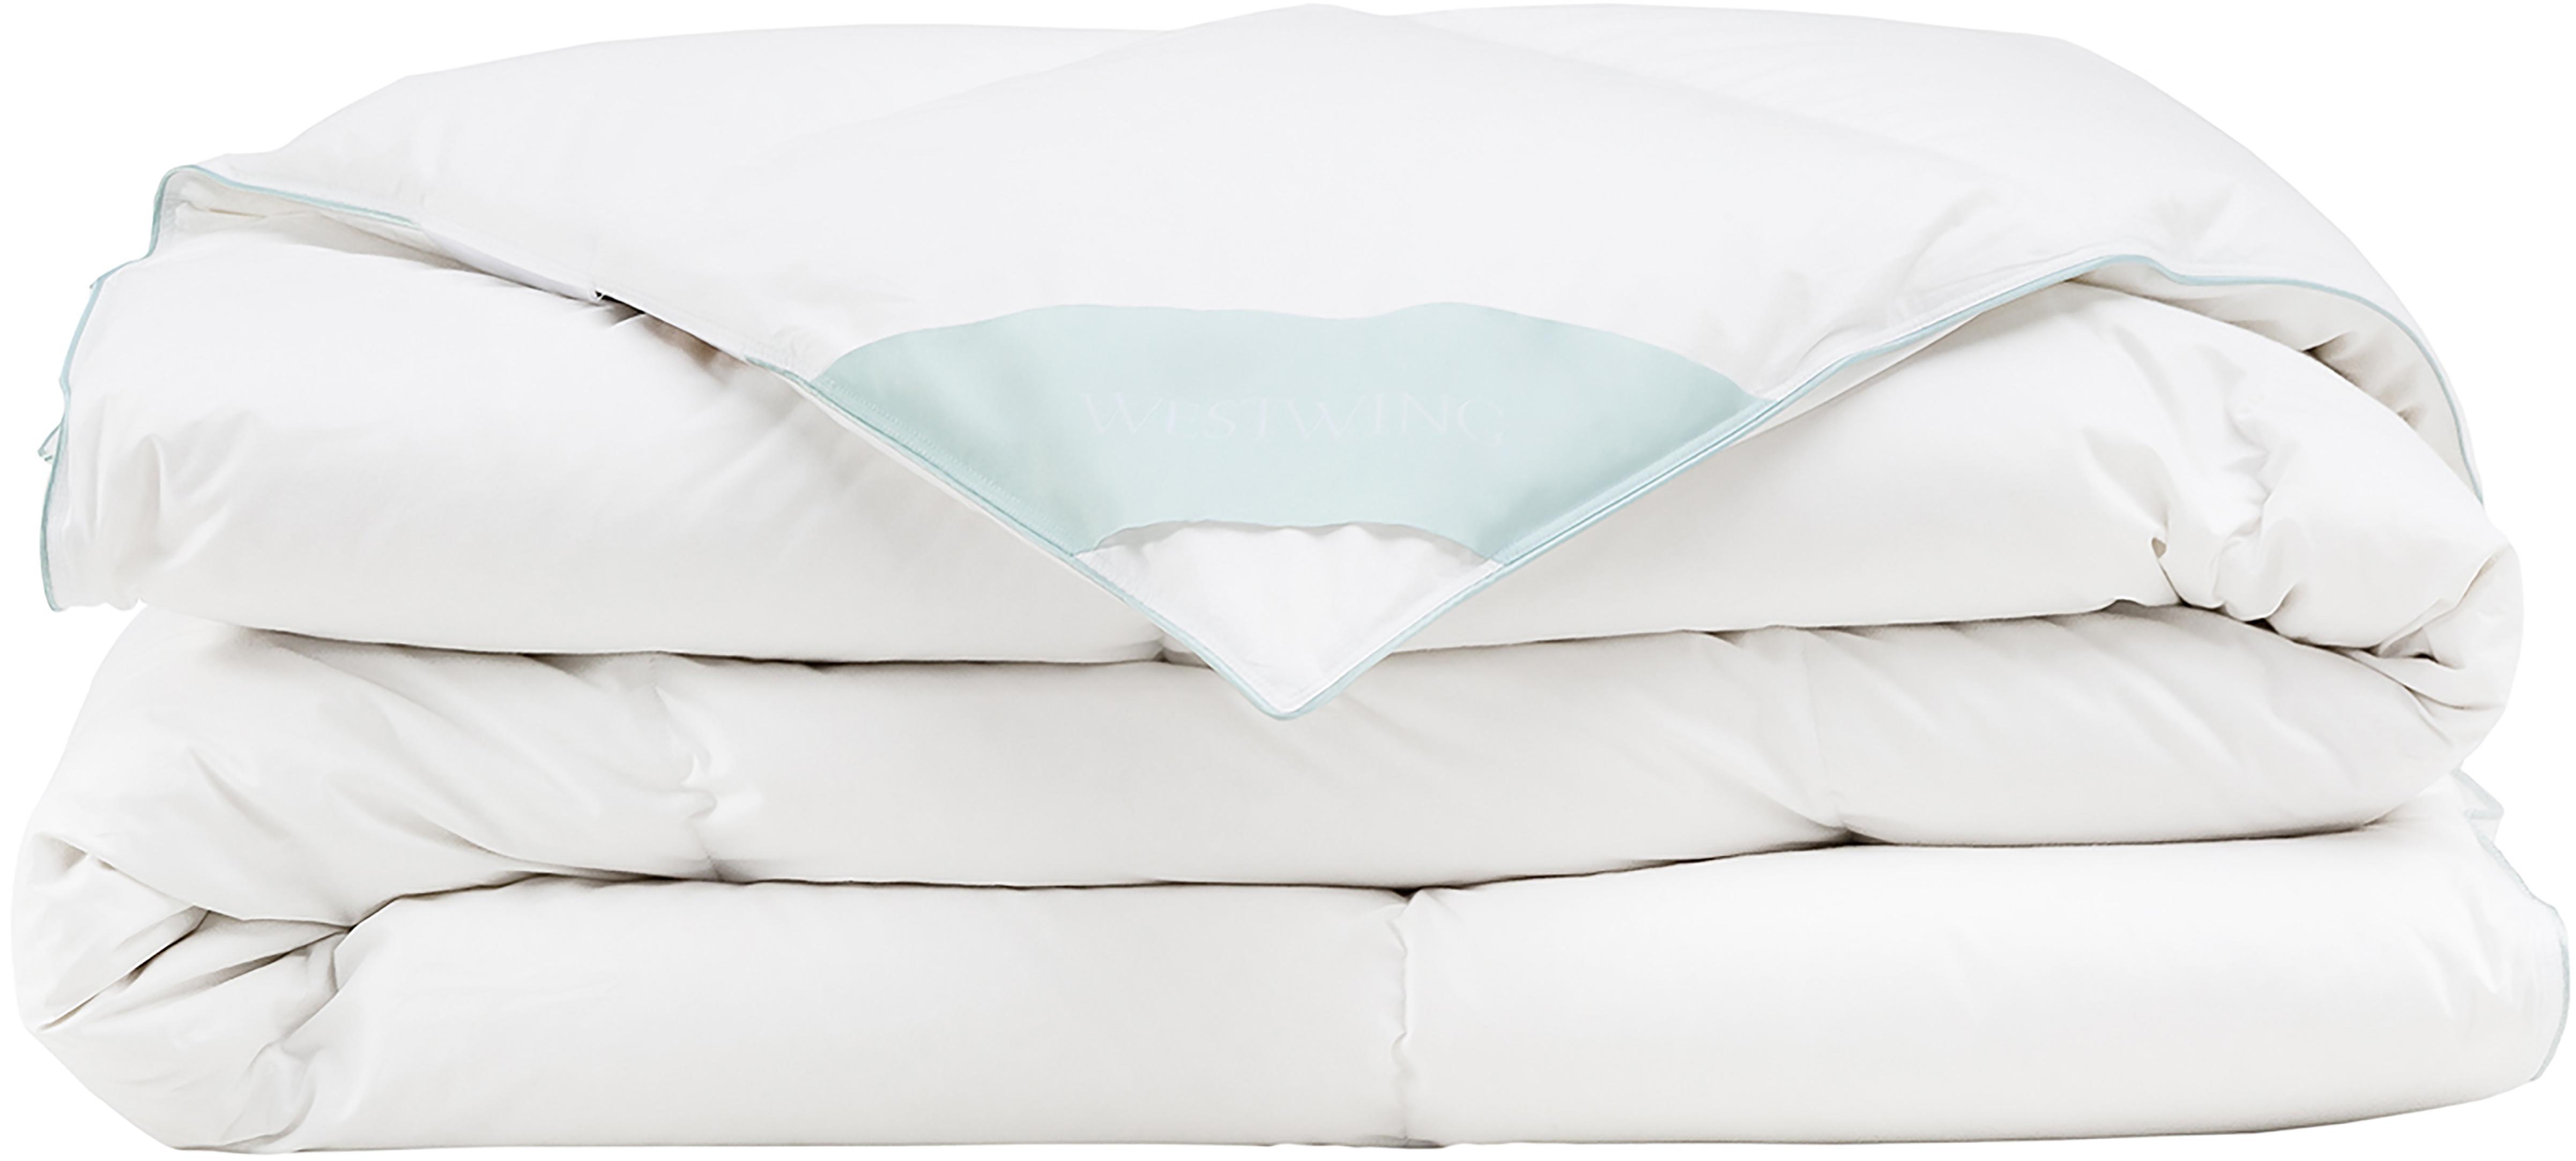 Daunen-Bettdecke Comfort, mittel, Hülle: 100% Baumwolle, feine Mak, Weiß, 240 x 220 cm